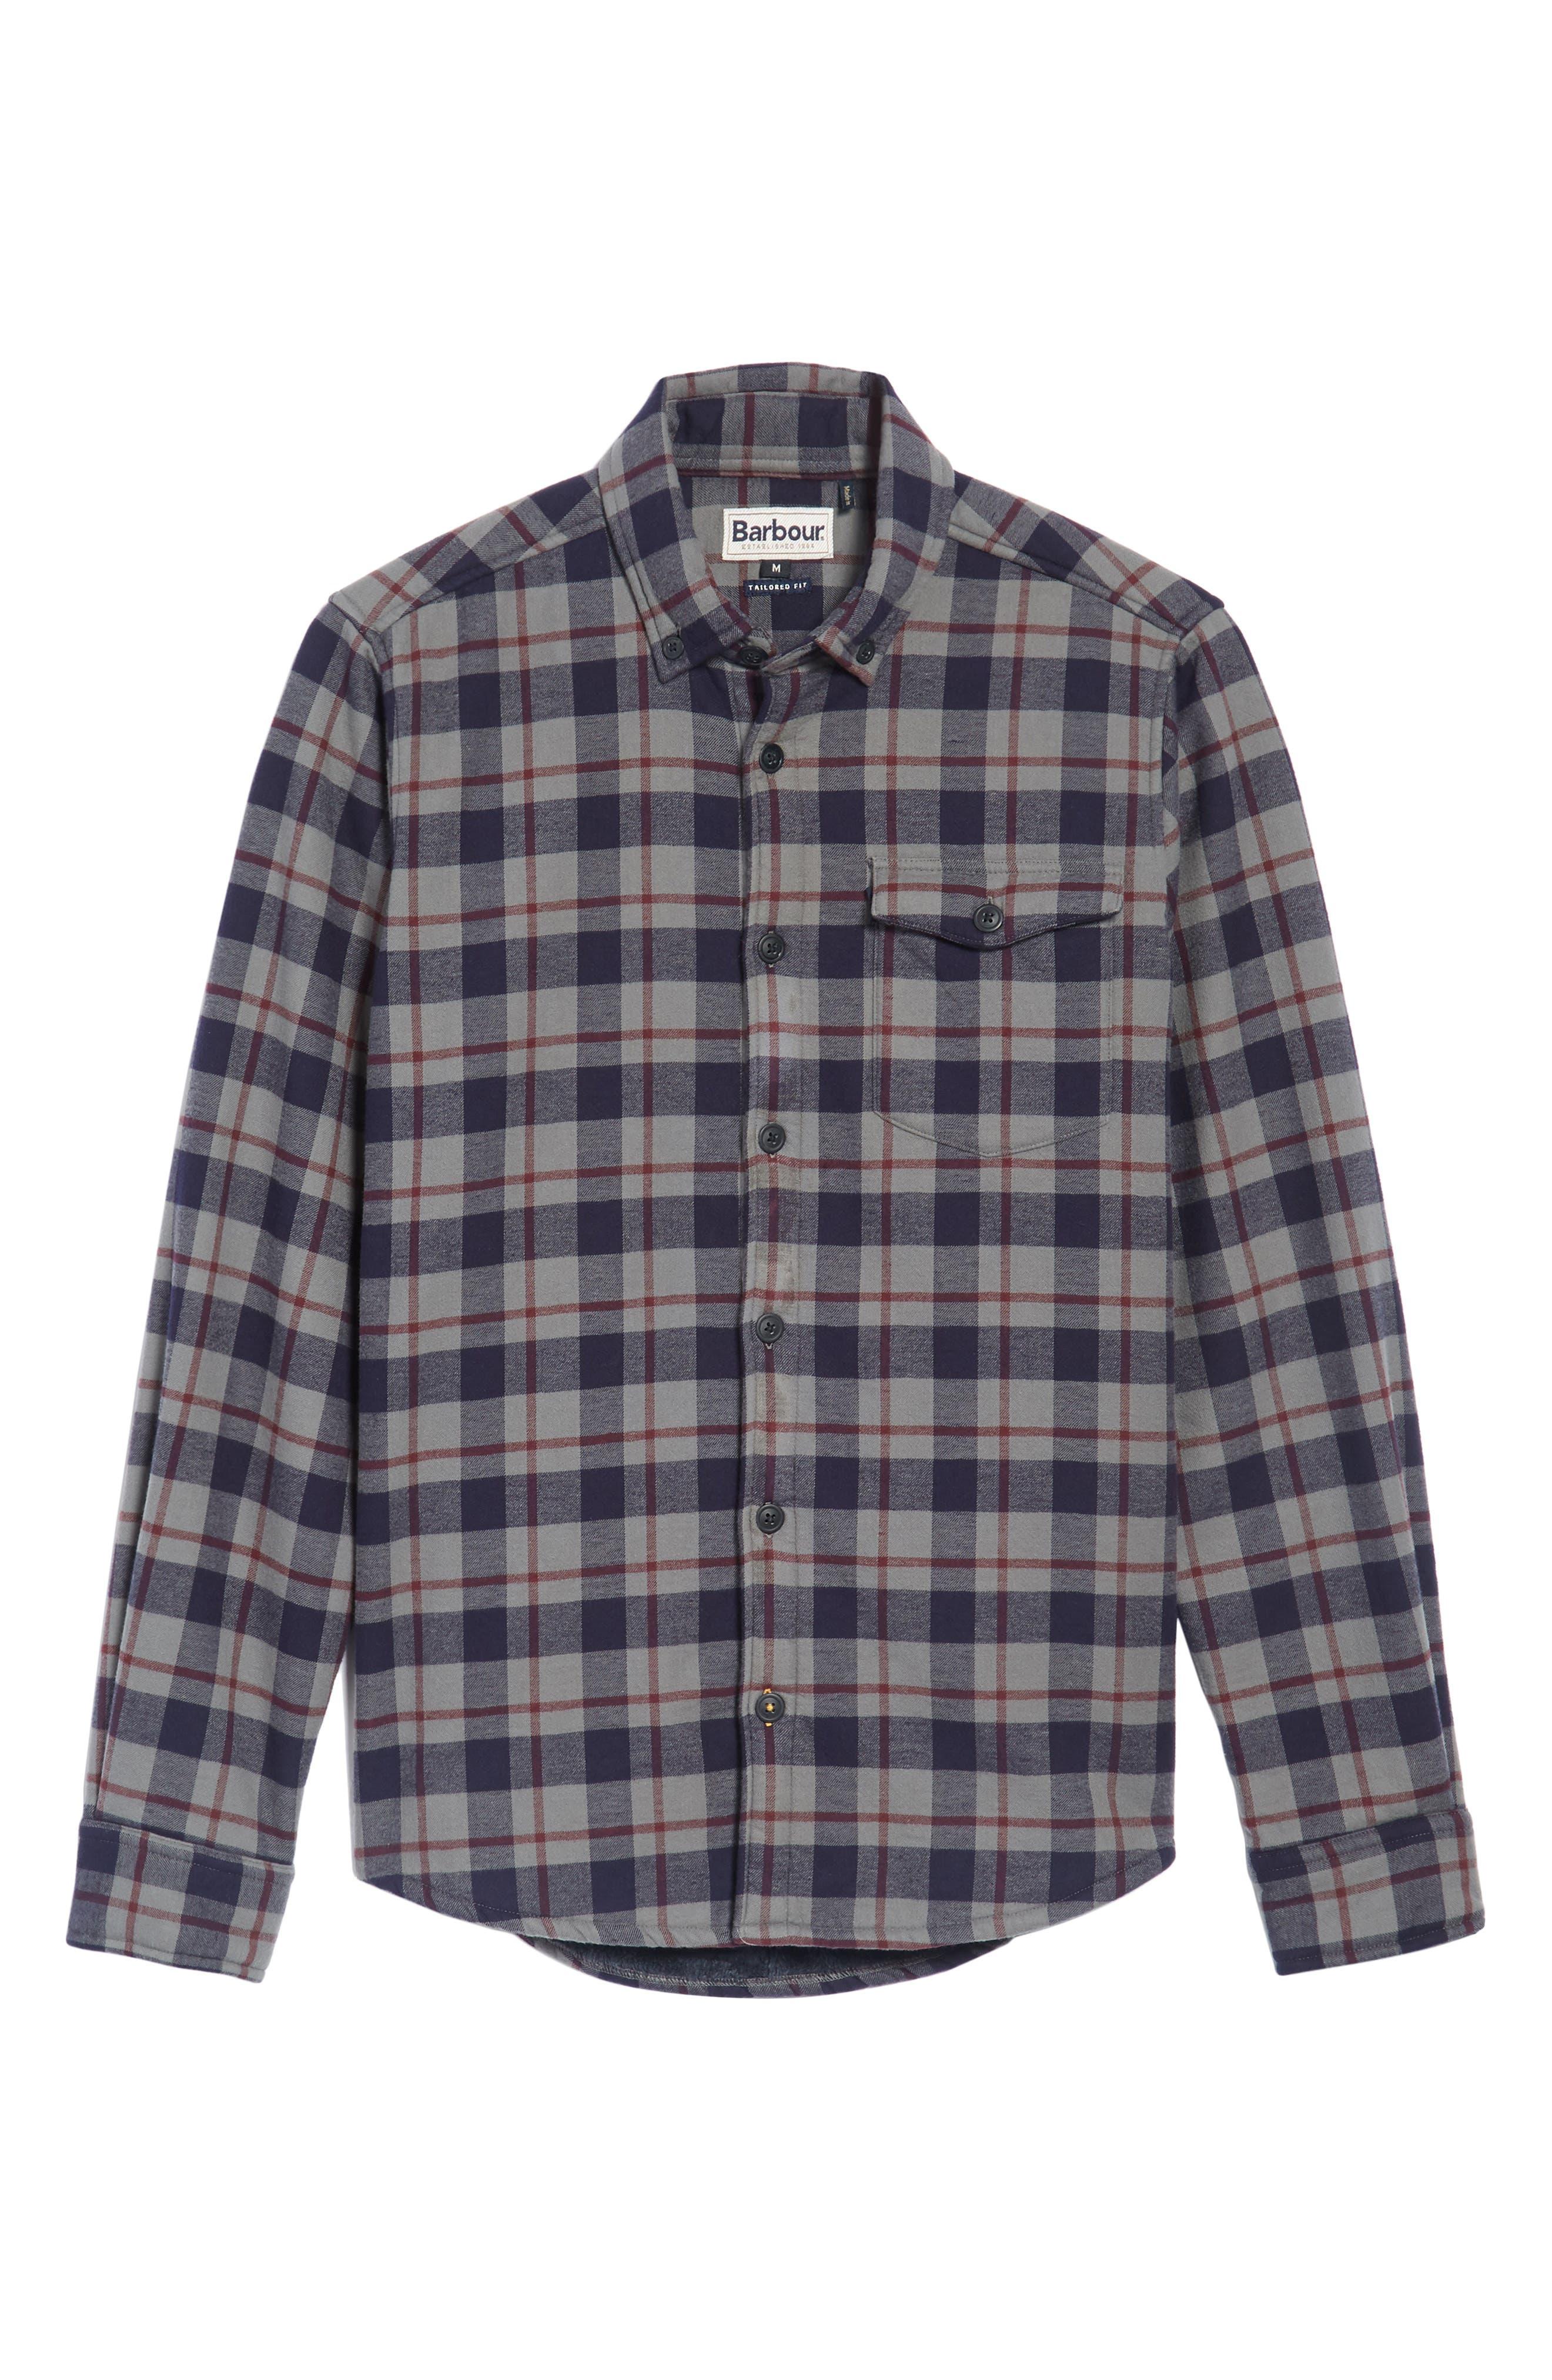 Hamilton Regular Fit Faux Fur Lined Shirt Jacket,                             Alternate thumbnail 6, color,                             Grey